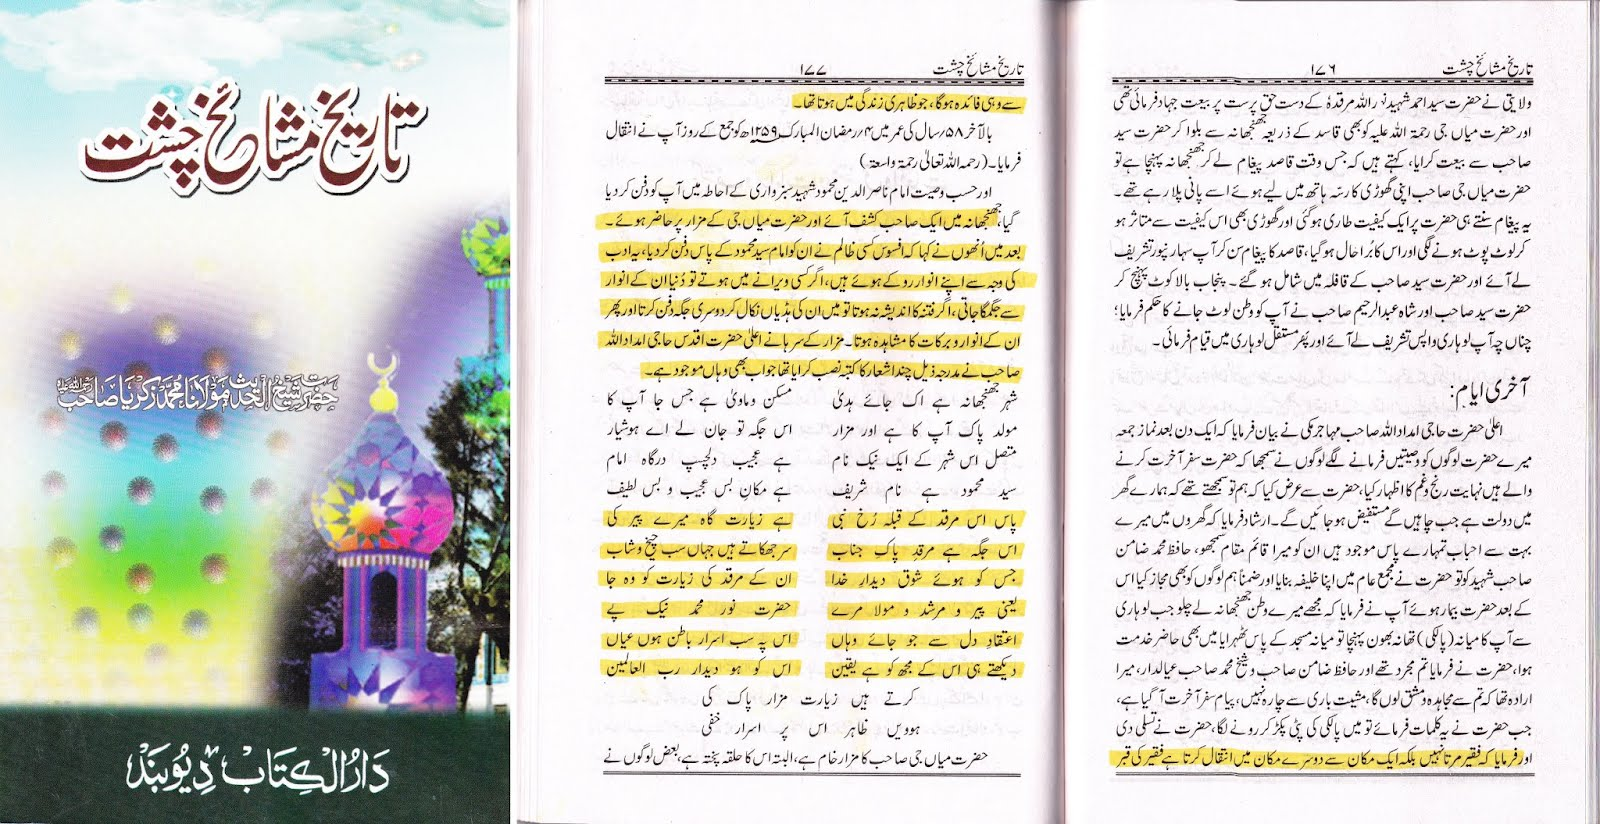 011 478849 261640603926412 100002414243345 528737 34028248 O Essay Example Harkat Mein Barkat In Amazing Urdu On Topic Hai Short Full